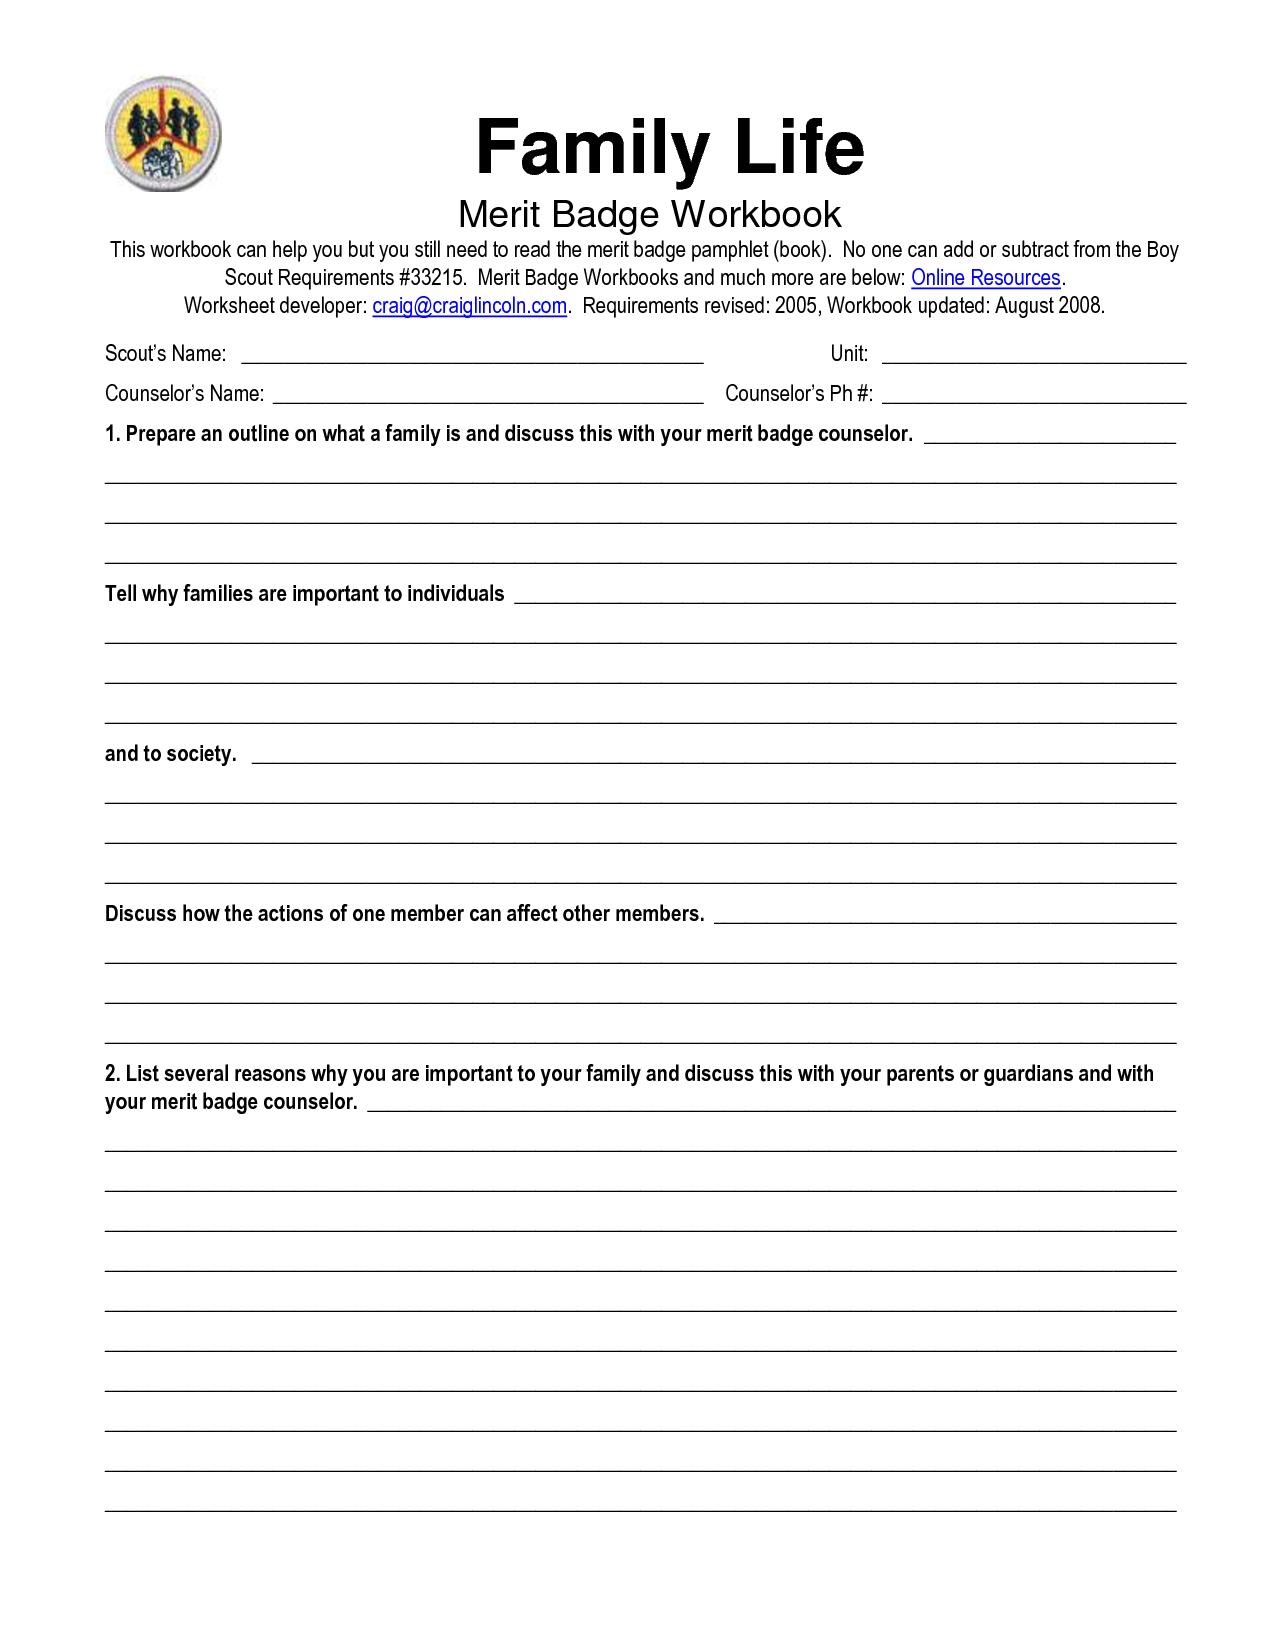 67 FAMILY ROLES WORKSHEET PDF